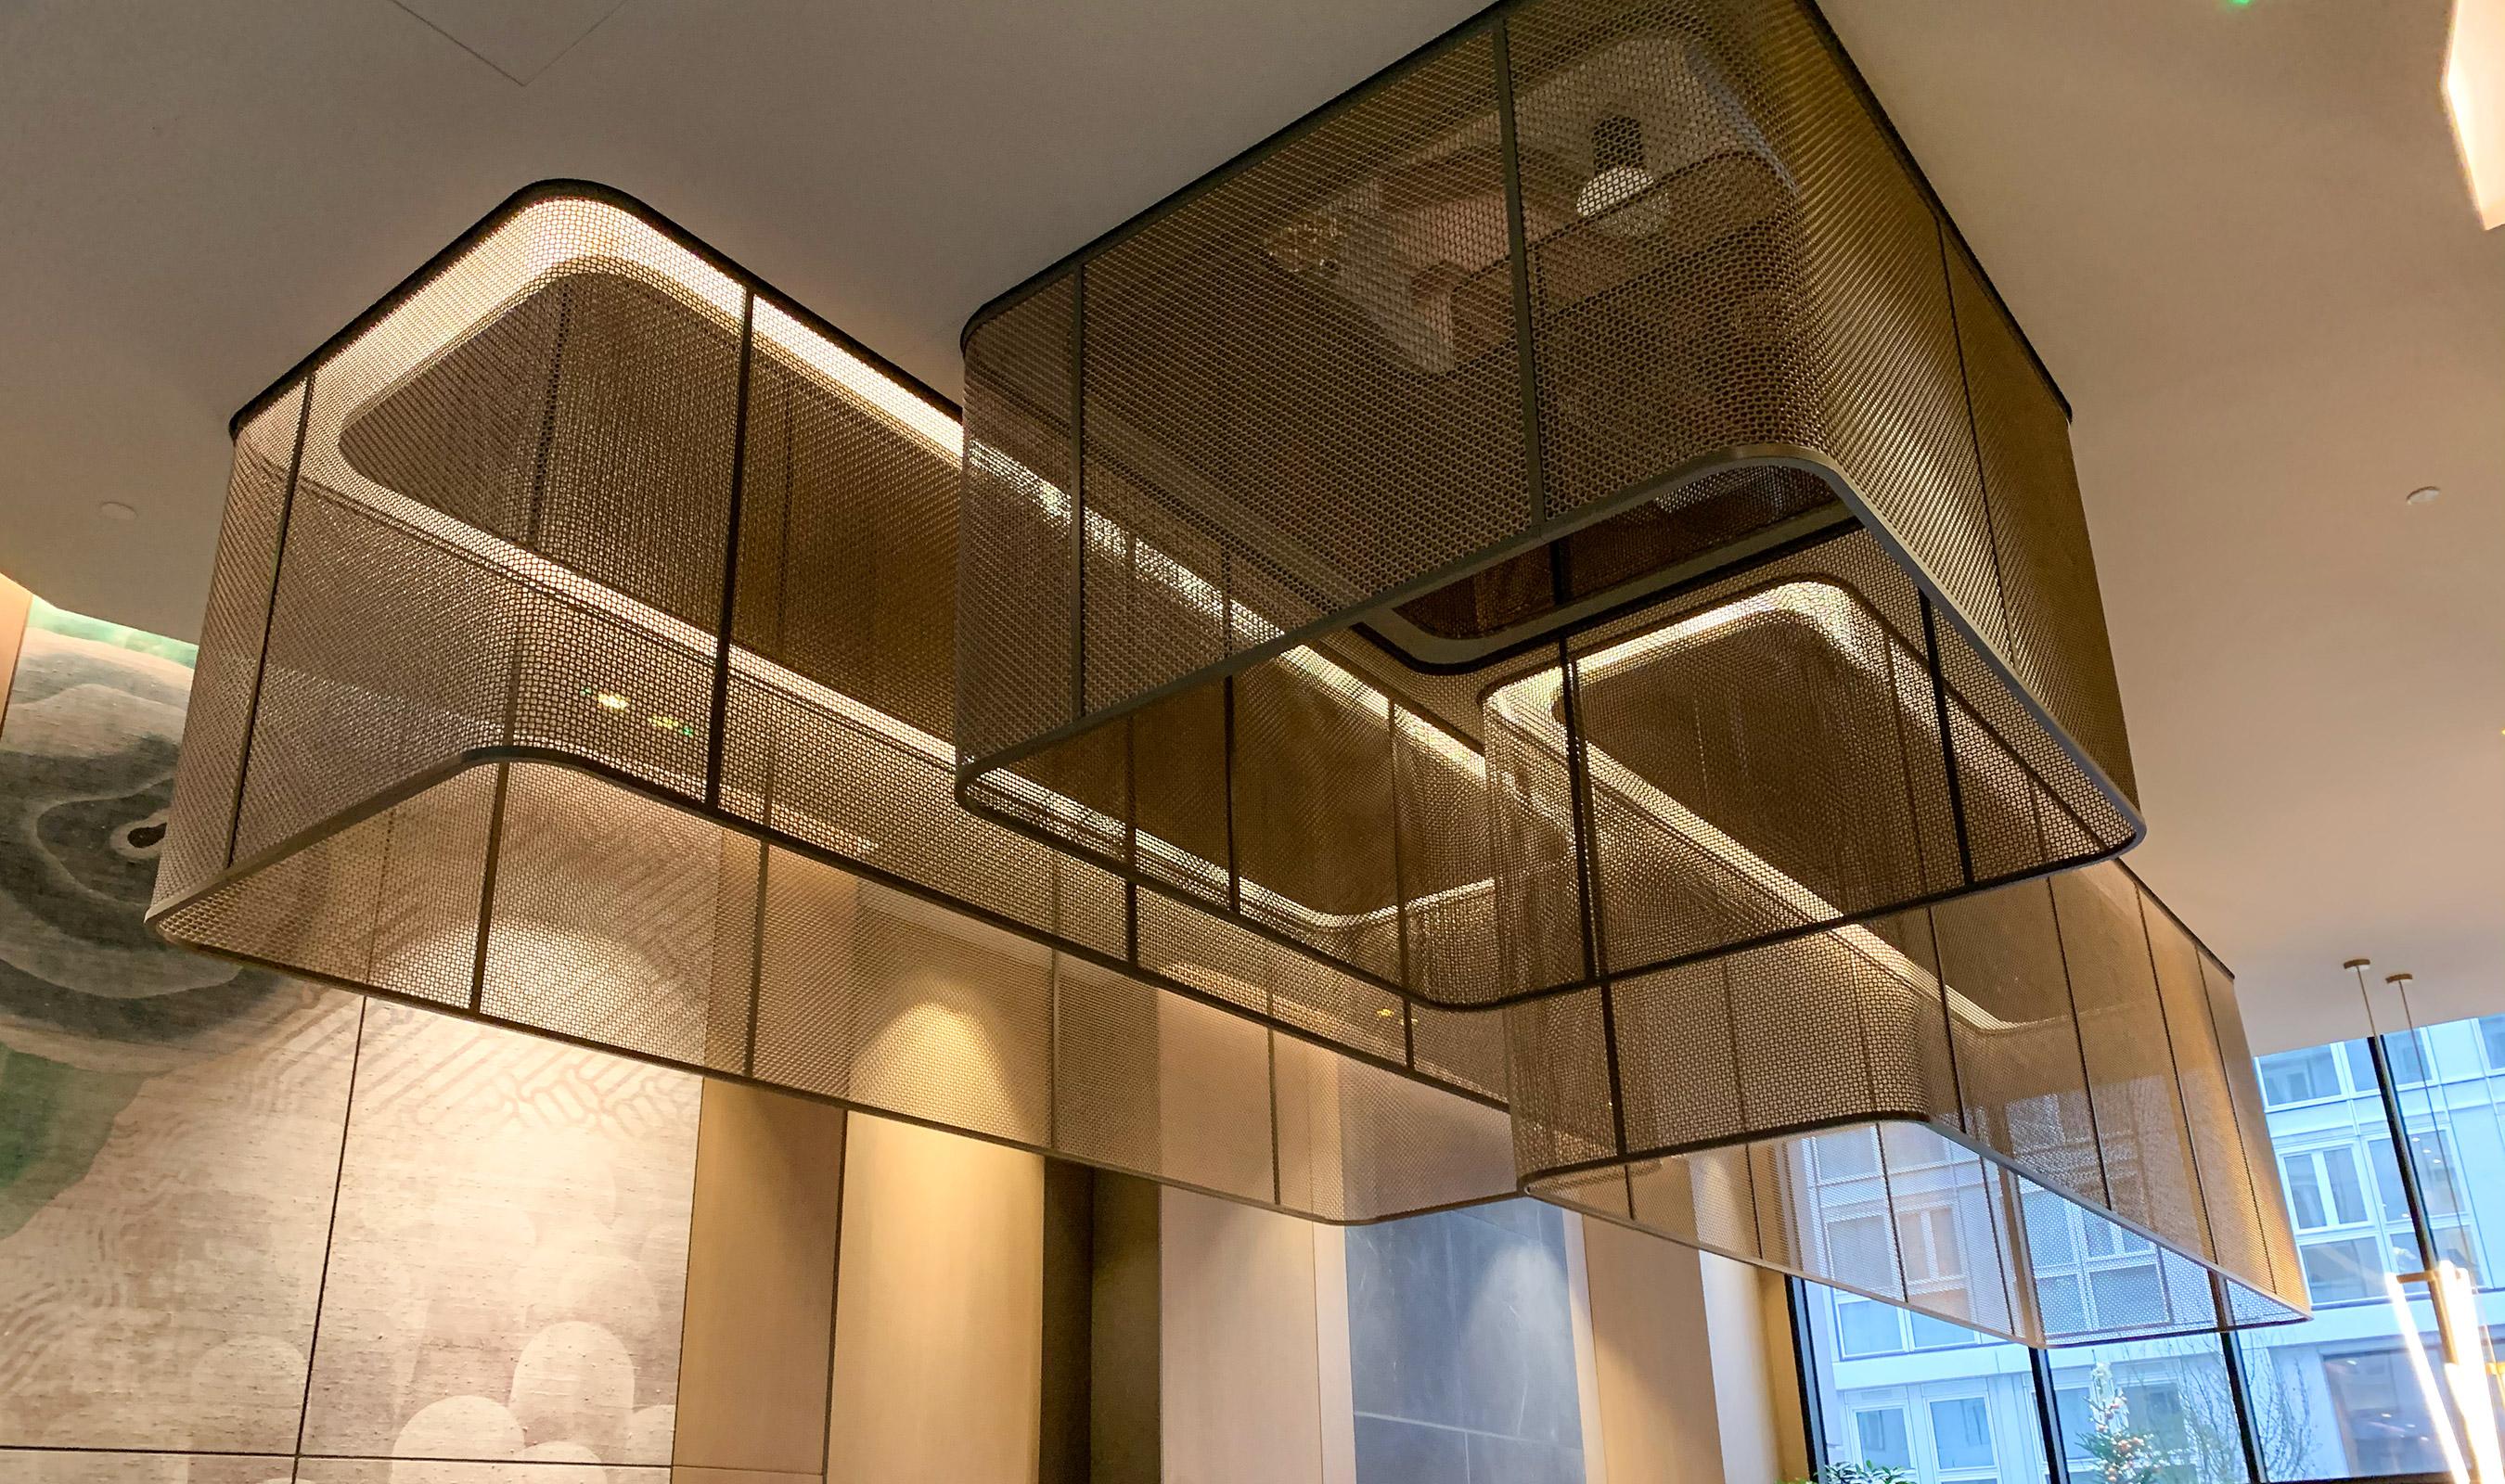 M22-83 Decorative wire mesh ceiling